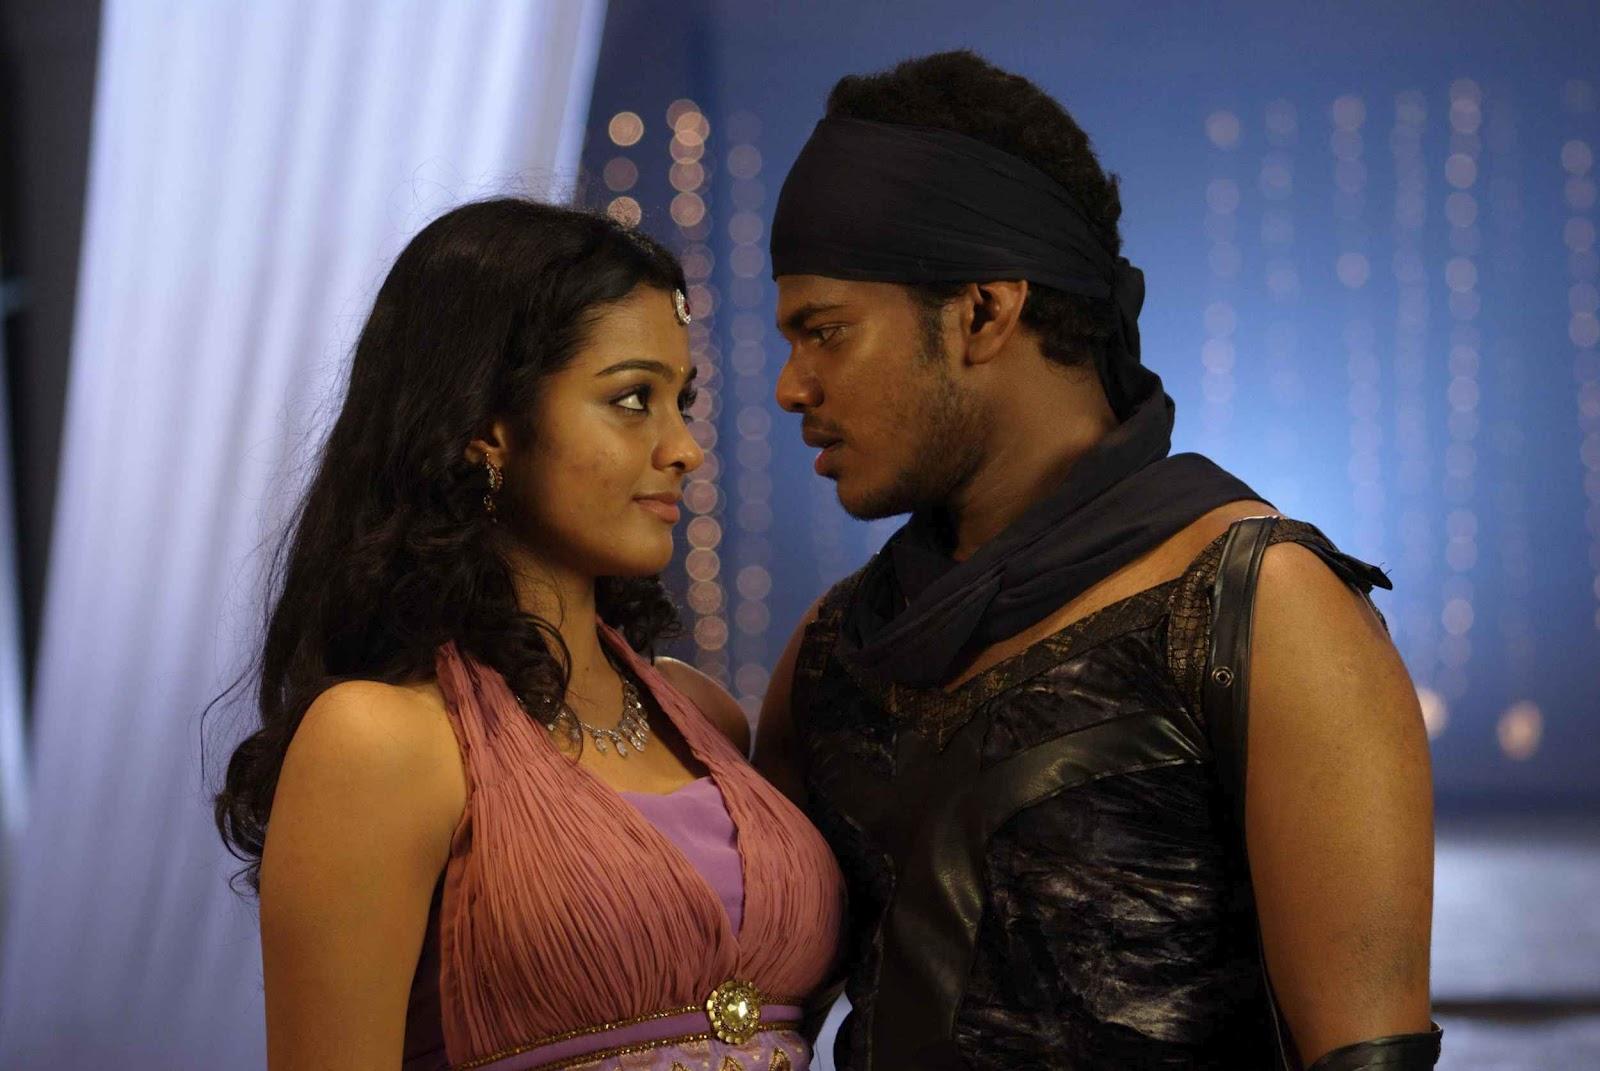 18 Vayasu 2011 - Tamil Mp3 Songs Download